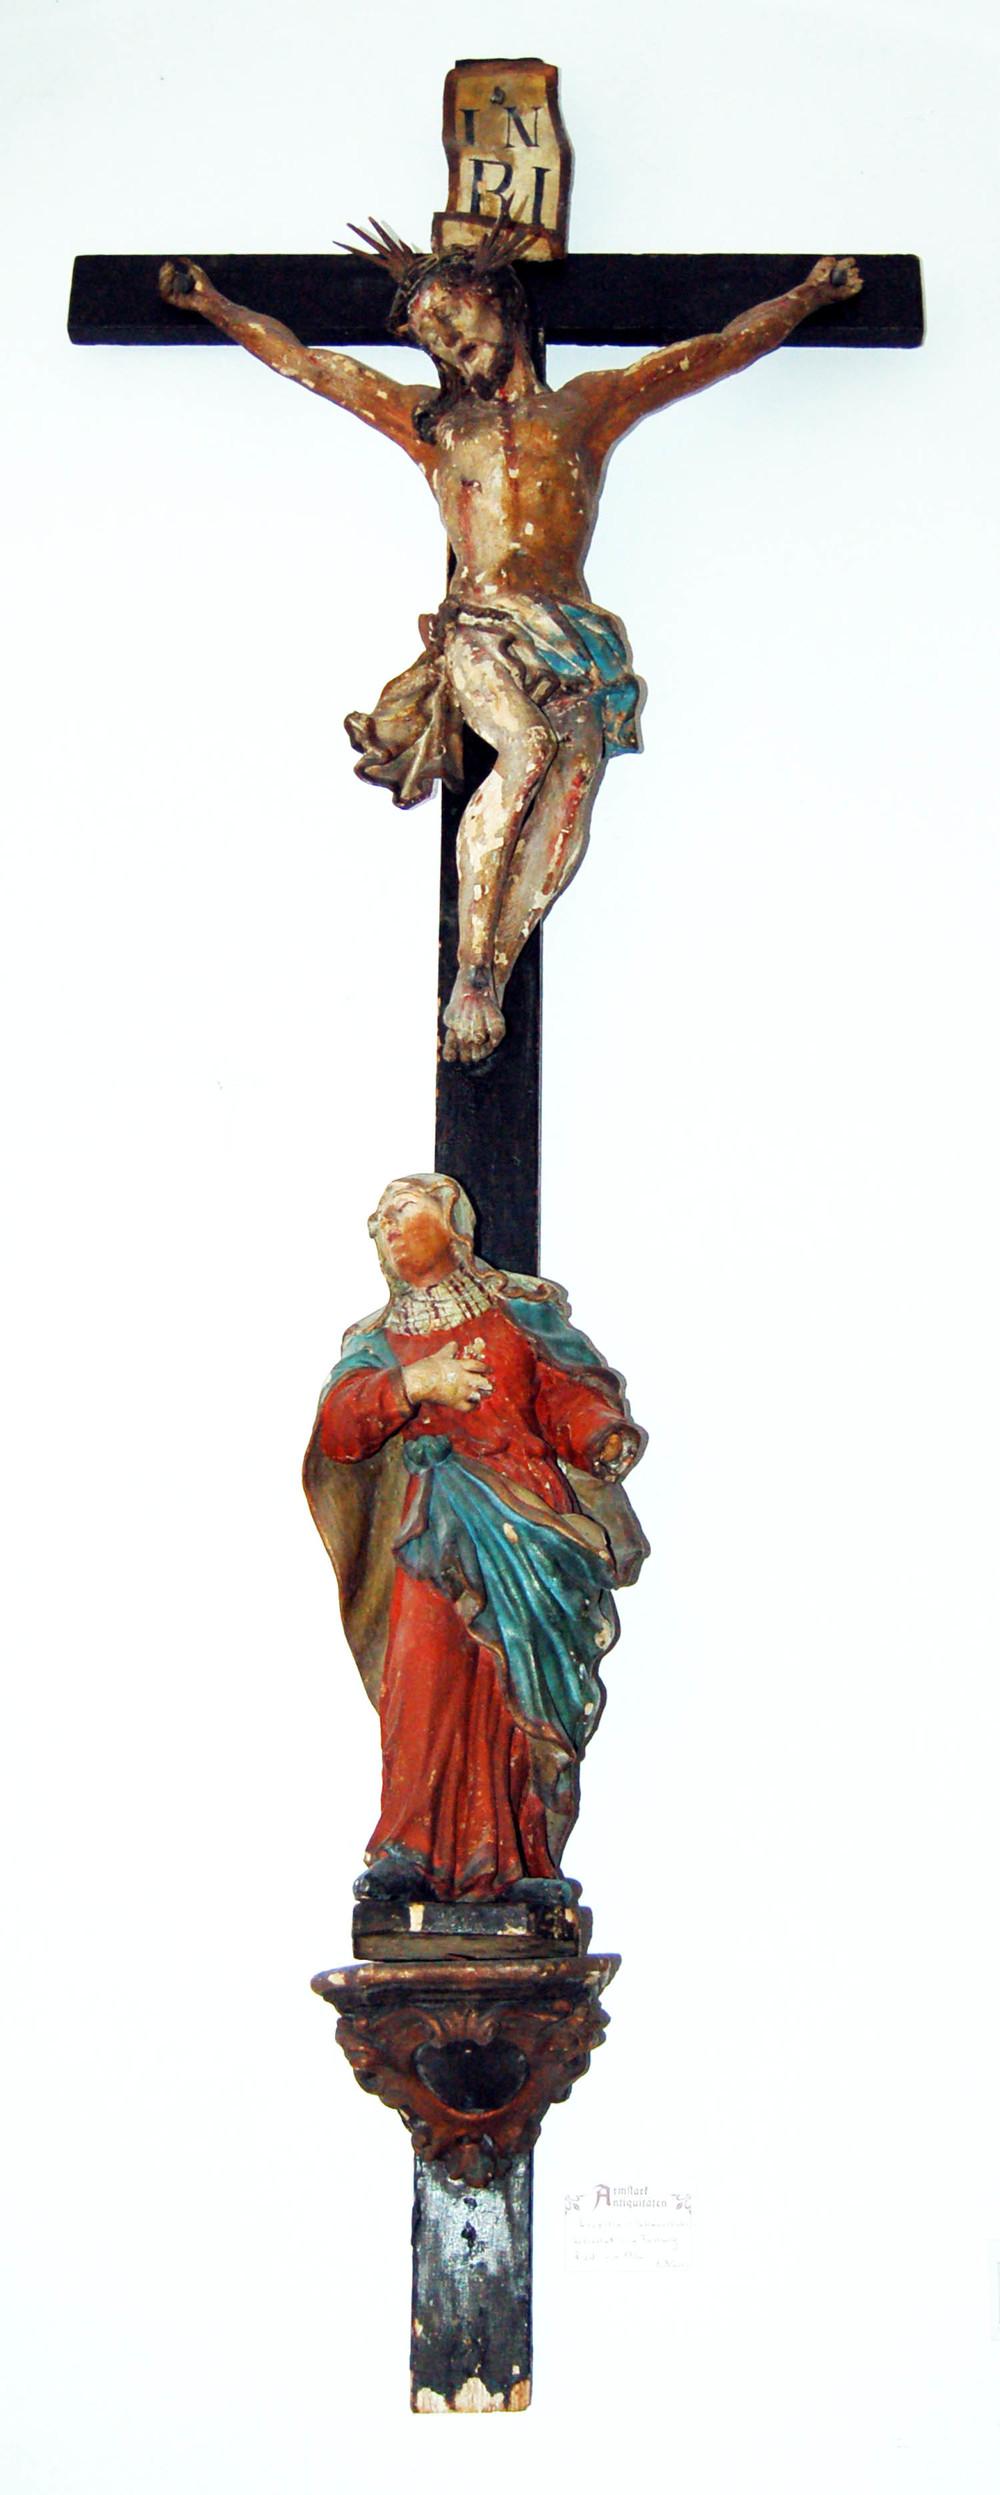 Kruzifix, Schwanthaler-Werkstatt, orig. Fassung, Ried/Innkreis, 18.Jh, Höhe ca. 175cm, Originalfassung teilweise abgeblättert